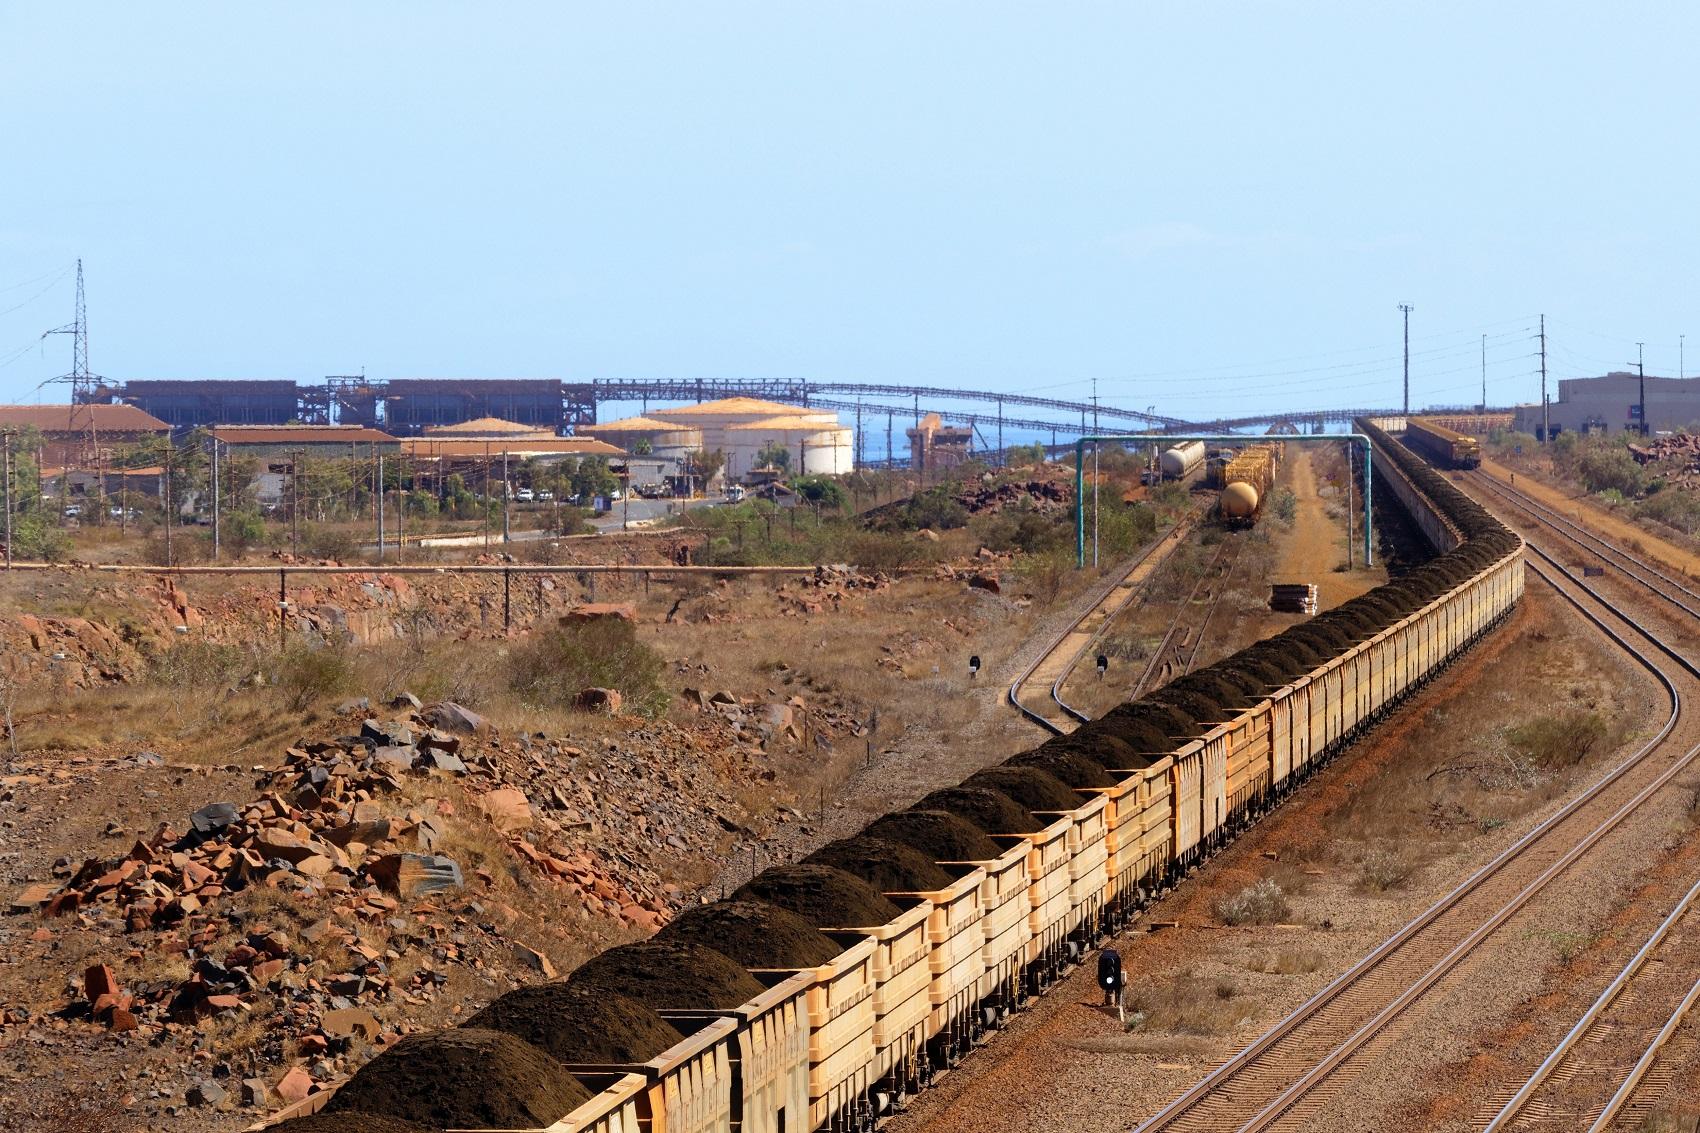 Minério de ferro sendo transportado por trem em Dampier, na Austrália (Foto: PAUL MAYALL / PICTURE ALLIANCE / DPA PICTURE-ALLIANCE / AFP)